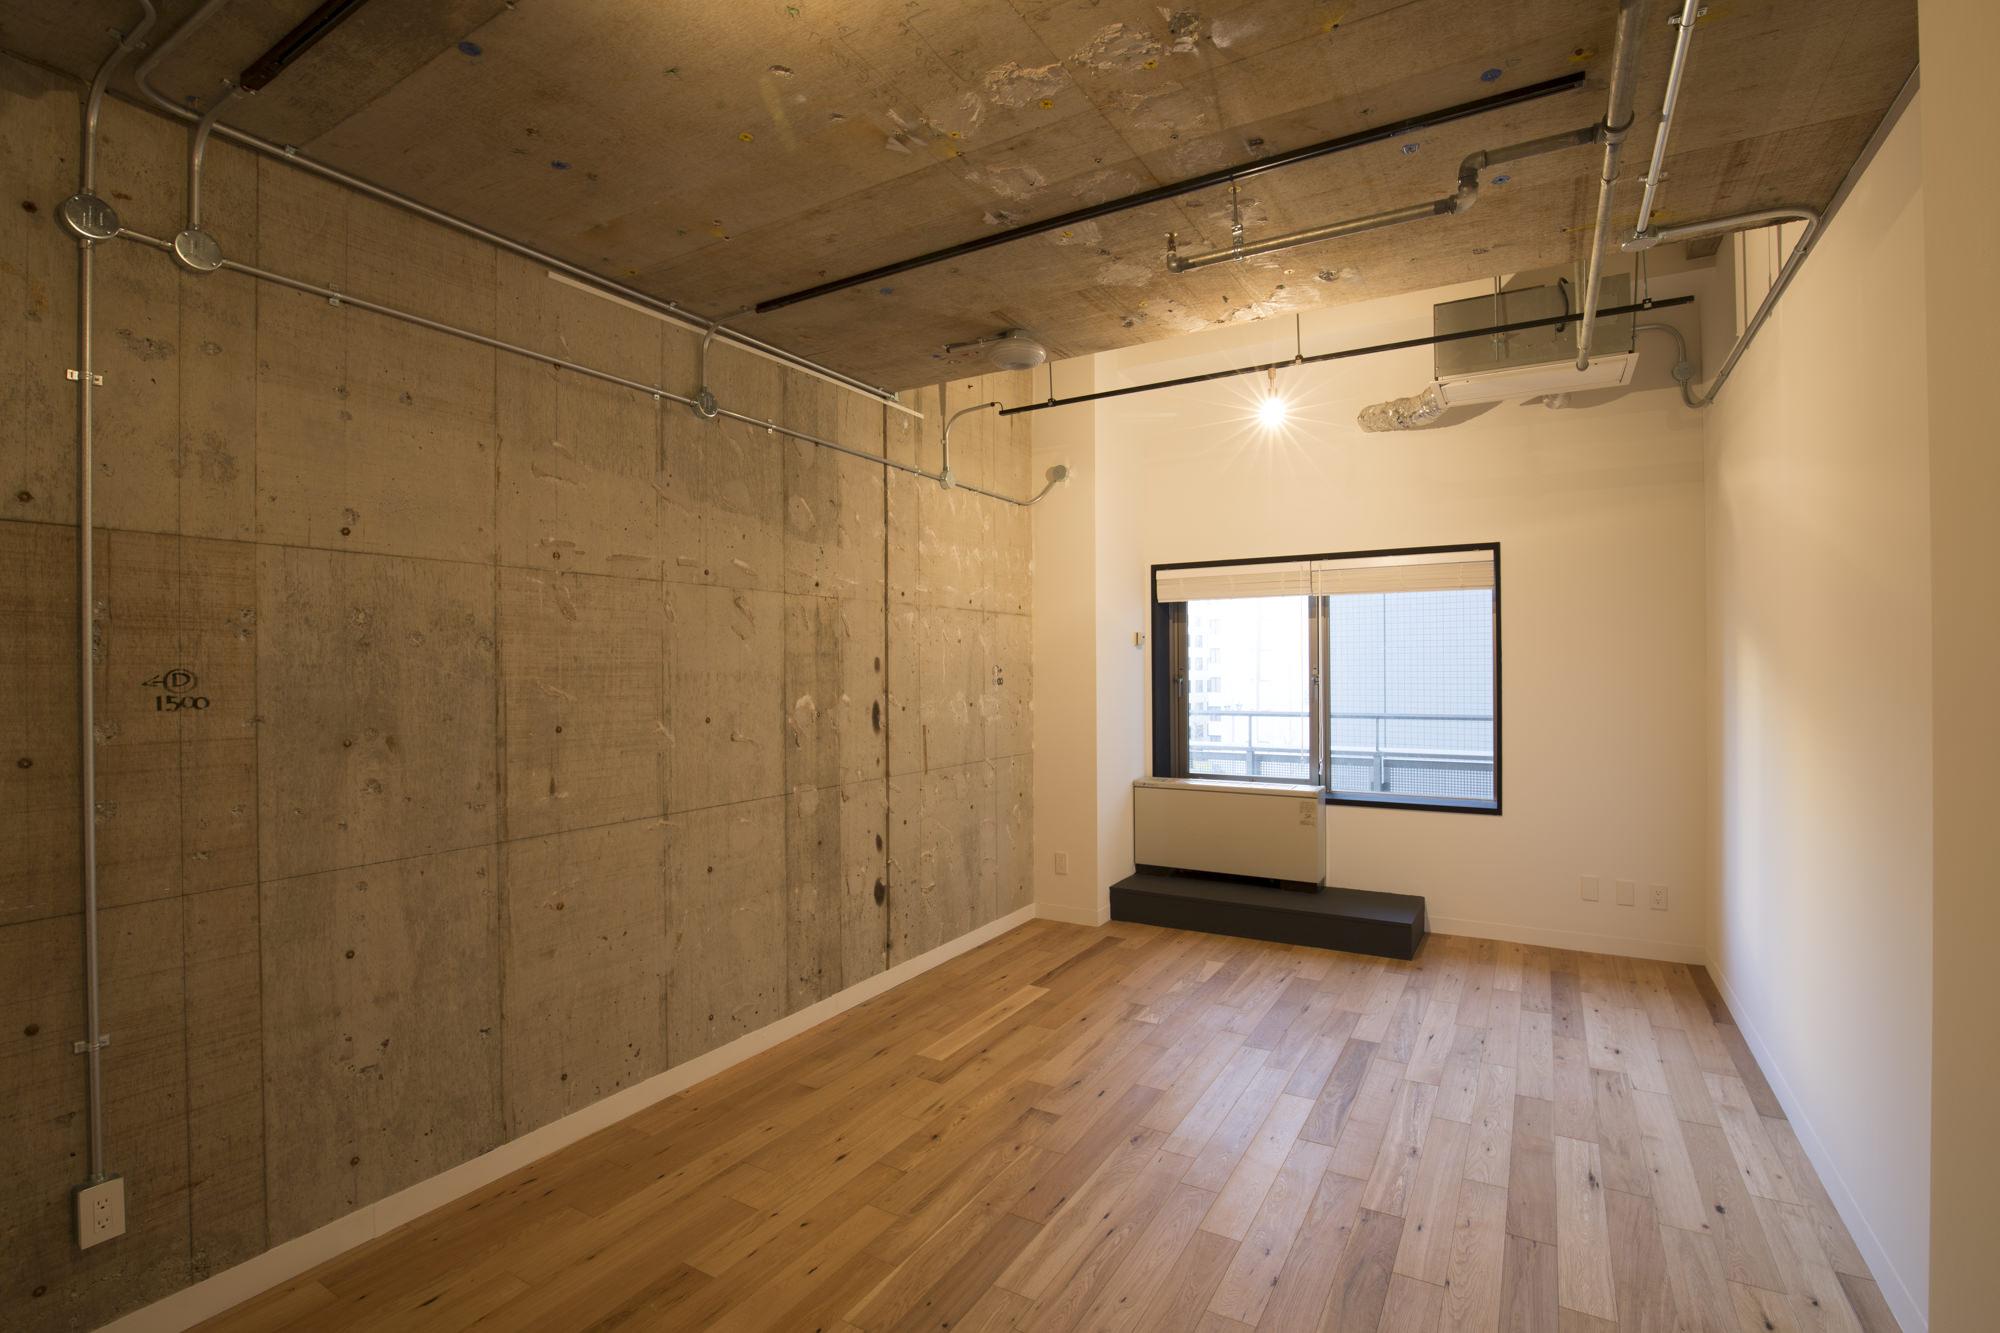 office 23㎡台~35㎡台 床:フローリング 天井:スケルトン